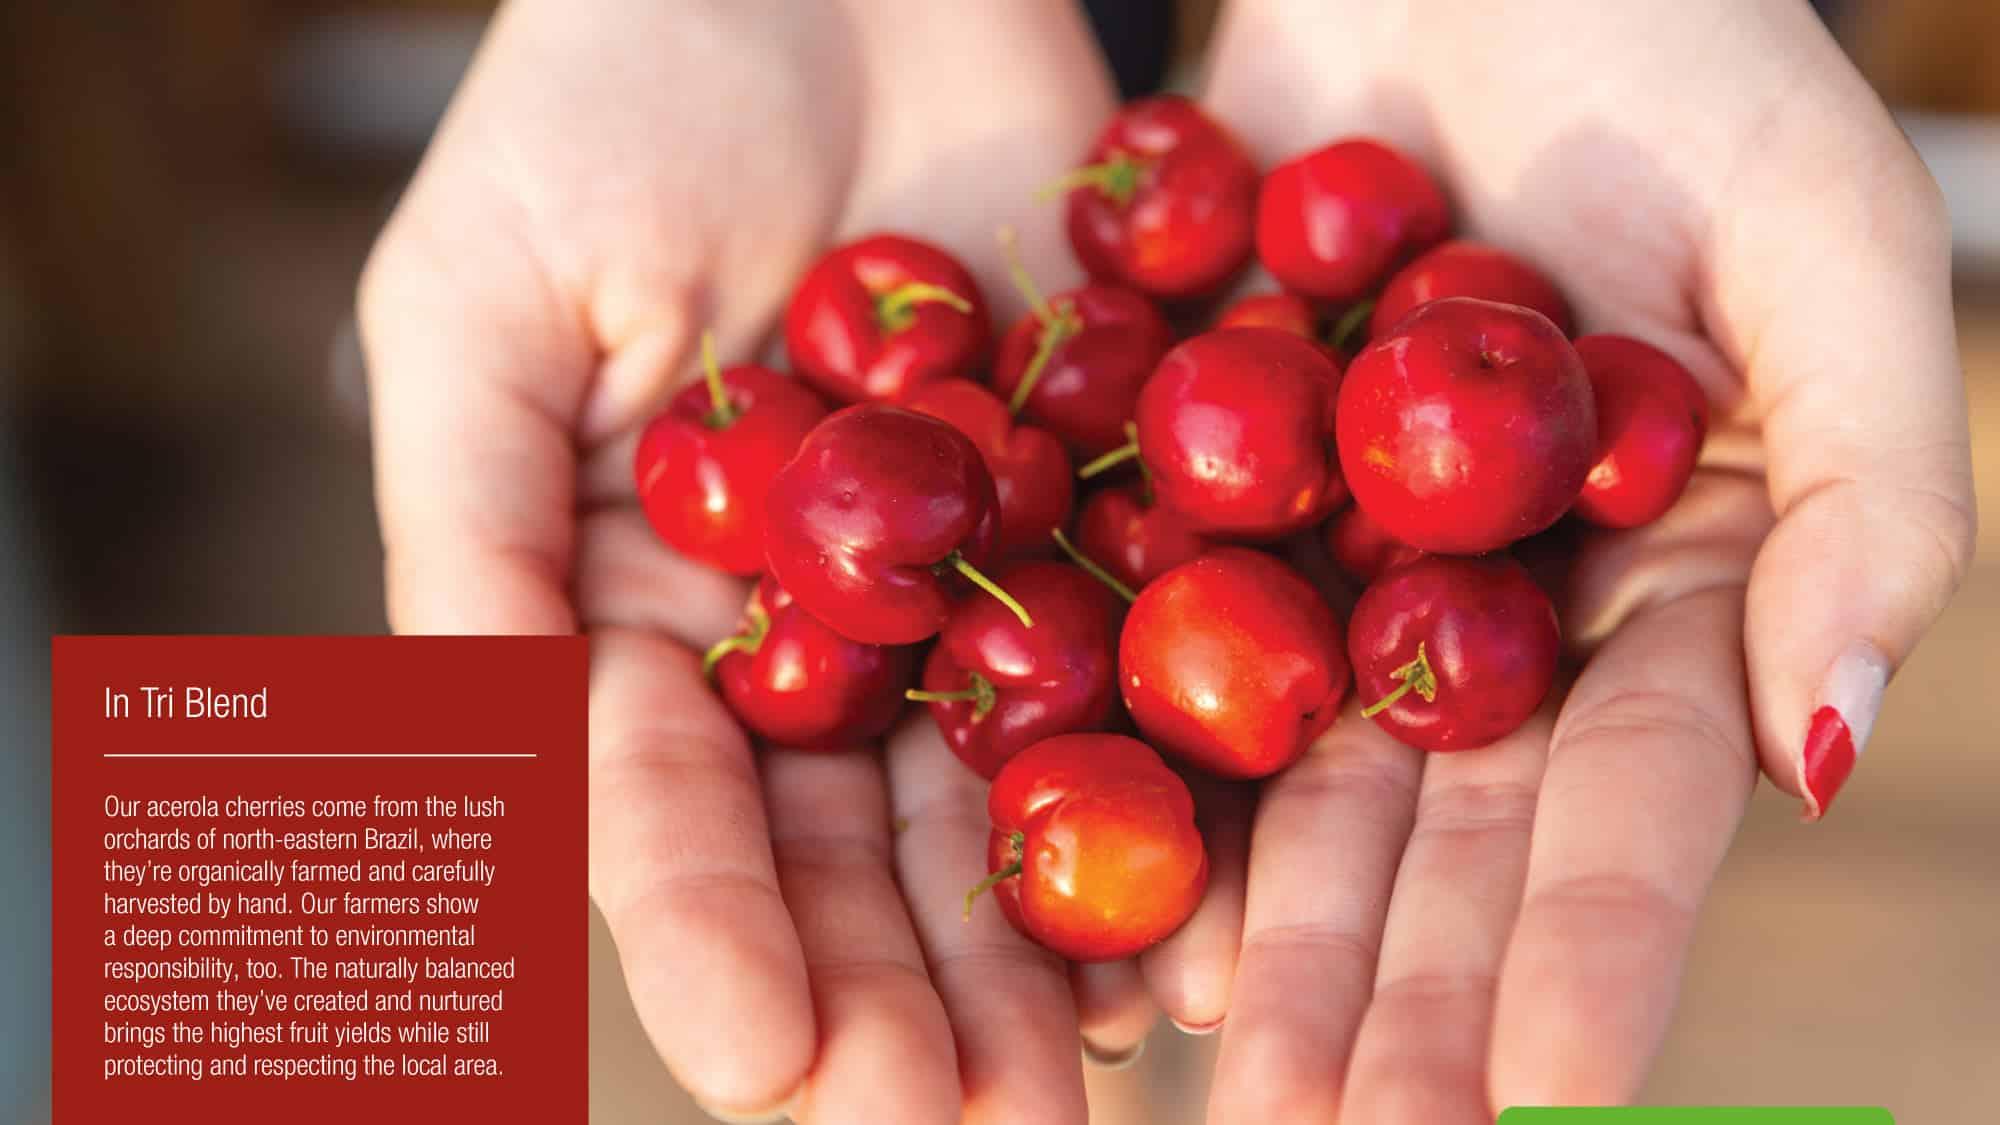 acerola-cherries-vegan-shake